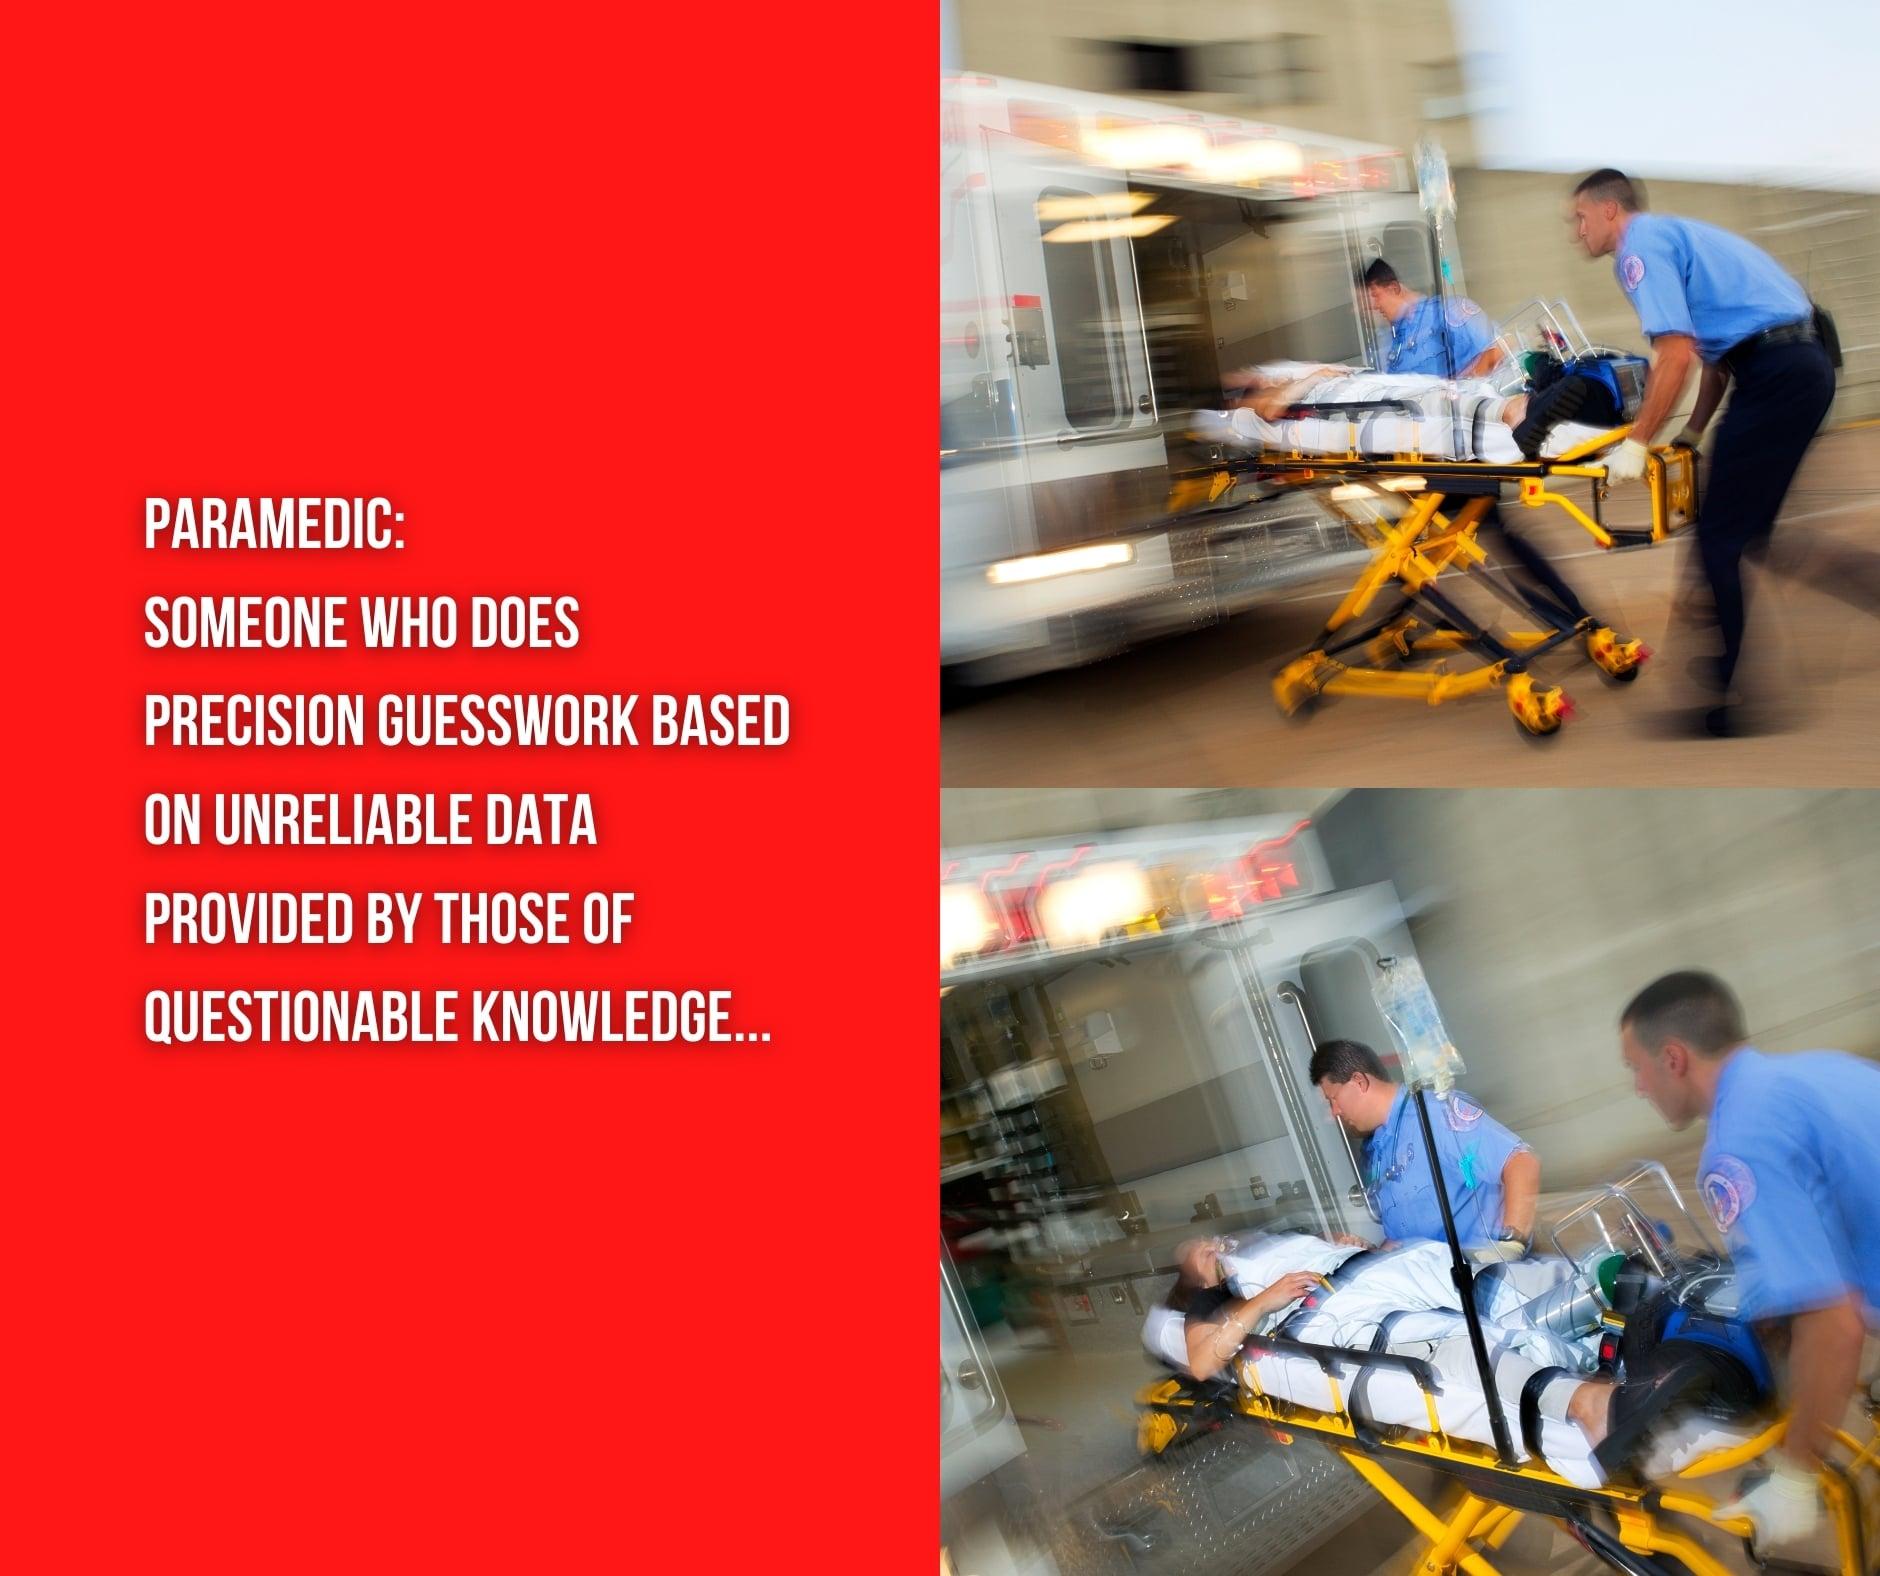 paramedic-heroes